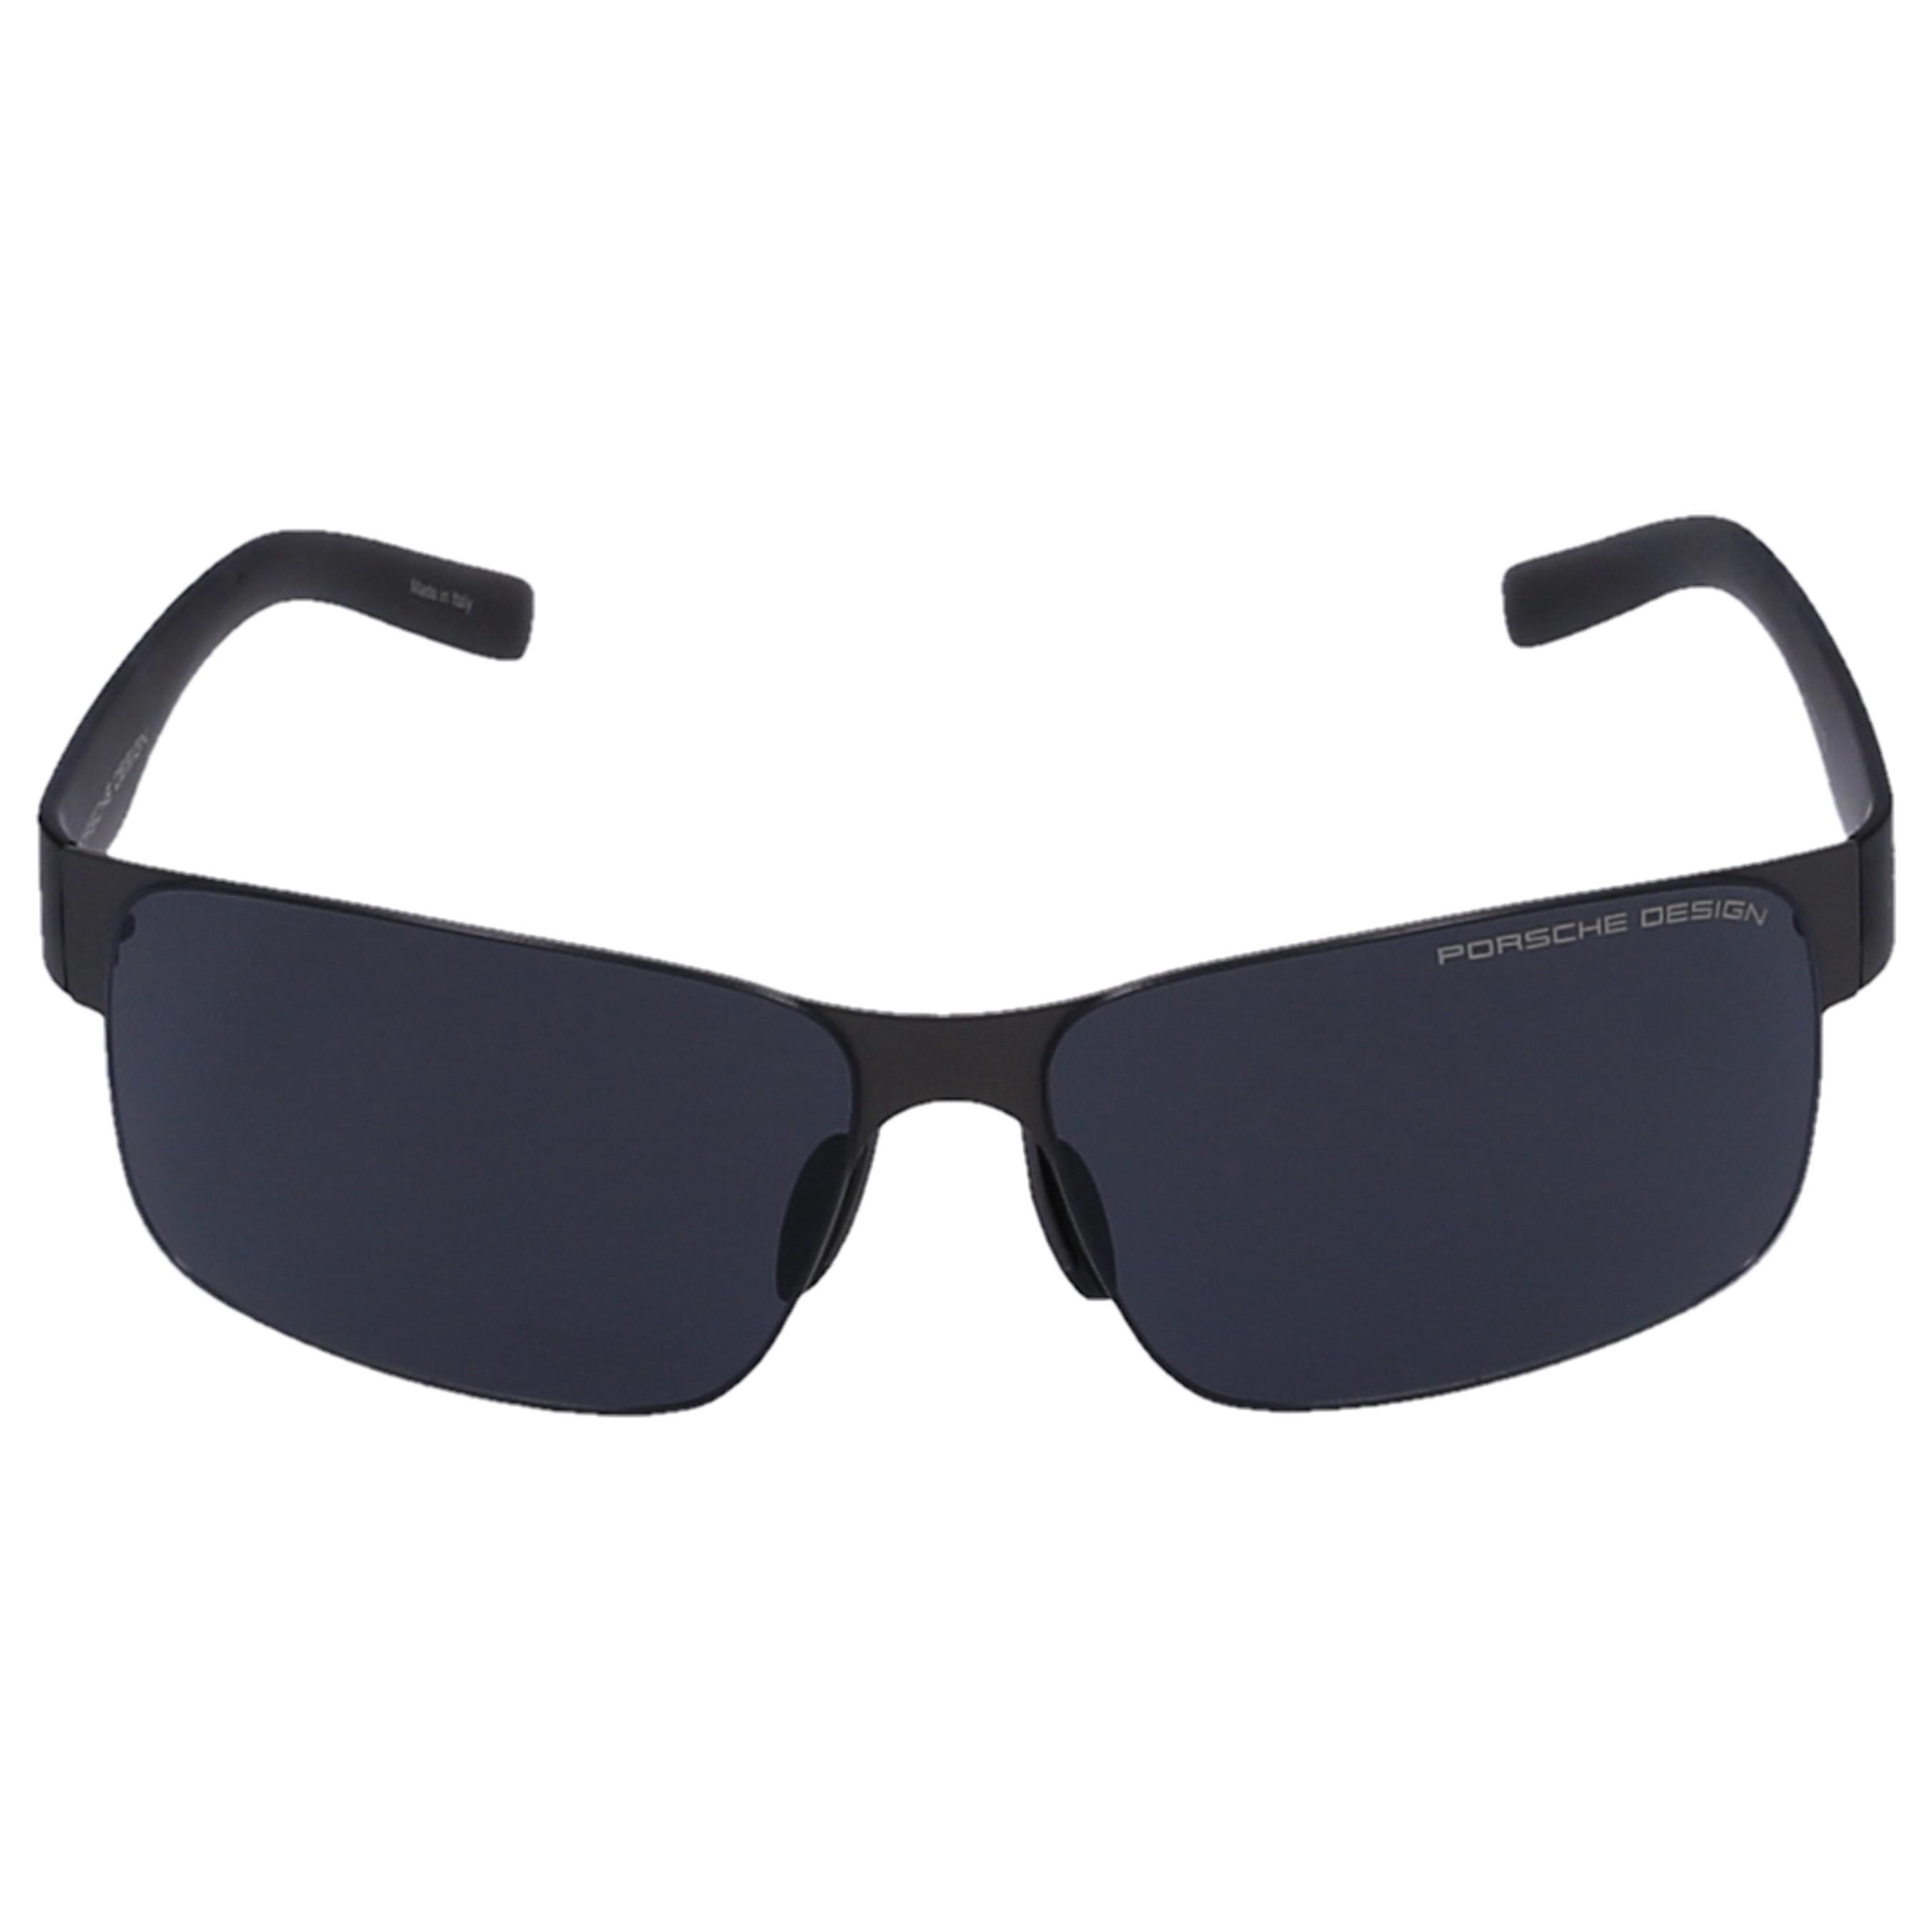 9da563c332e Porsche Design - Multicolor Men Sunglasses Wayfarer 8573 Acetate Grey for  Men - Lyst. View fullscreen